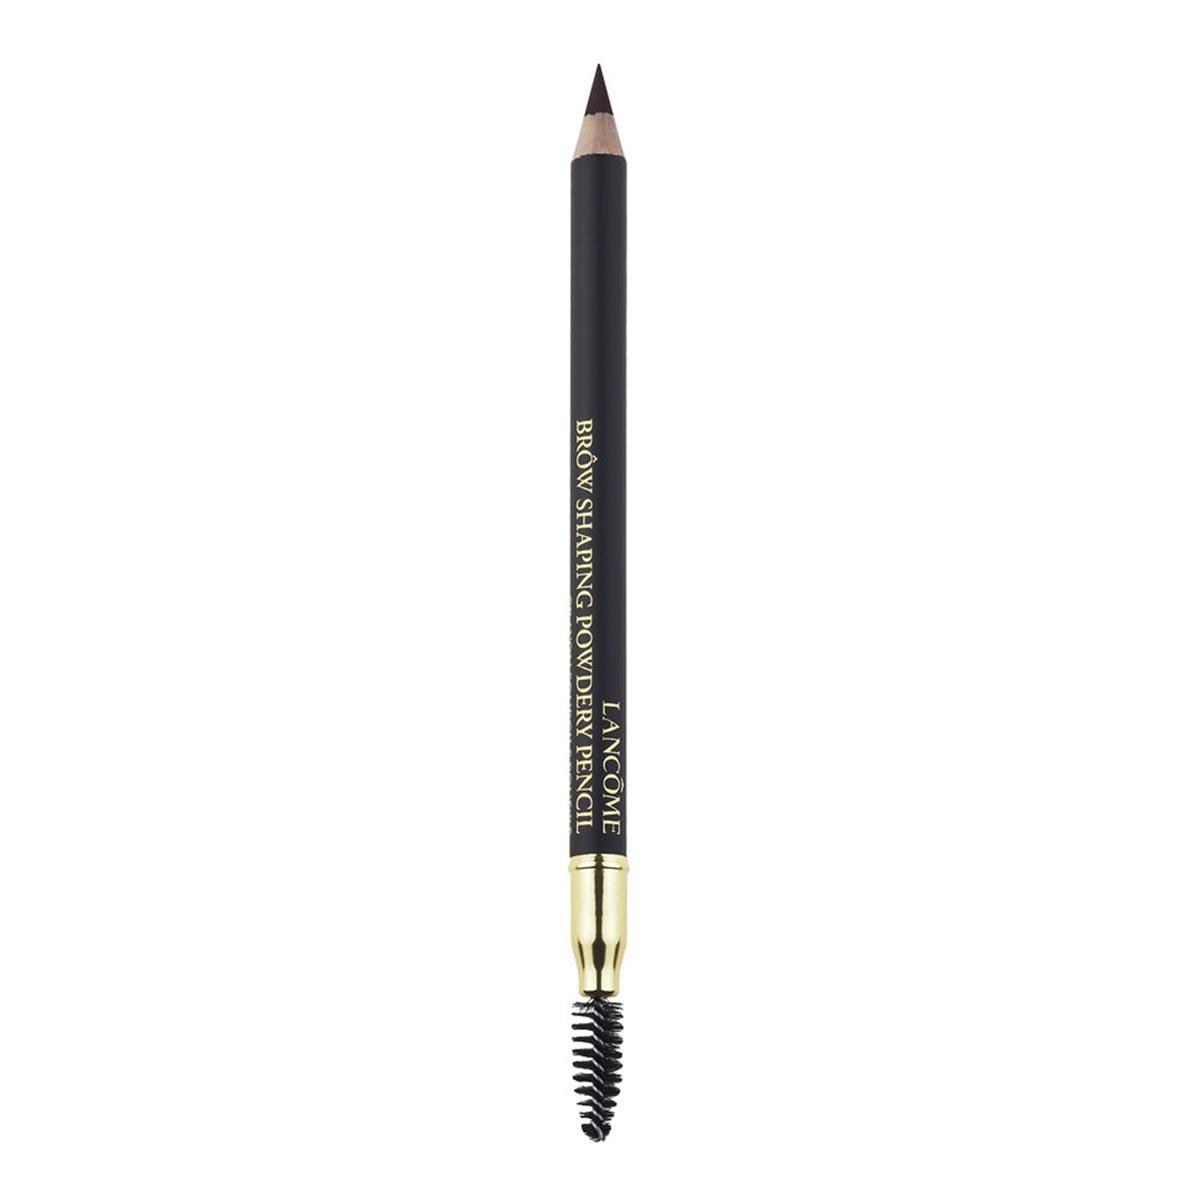 Lancome brow shaping powdery pencil 08 dark brown